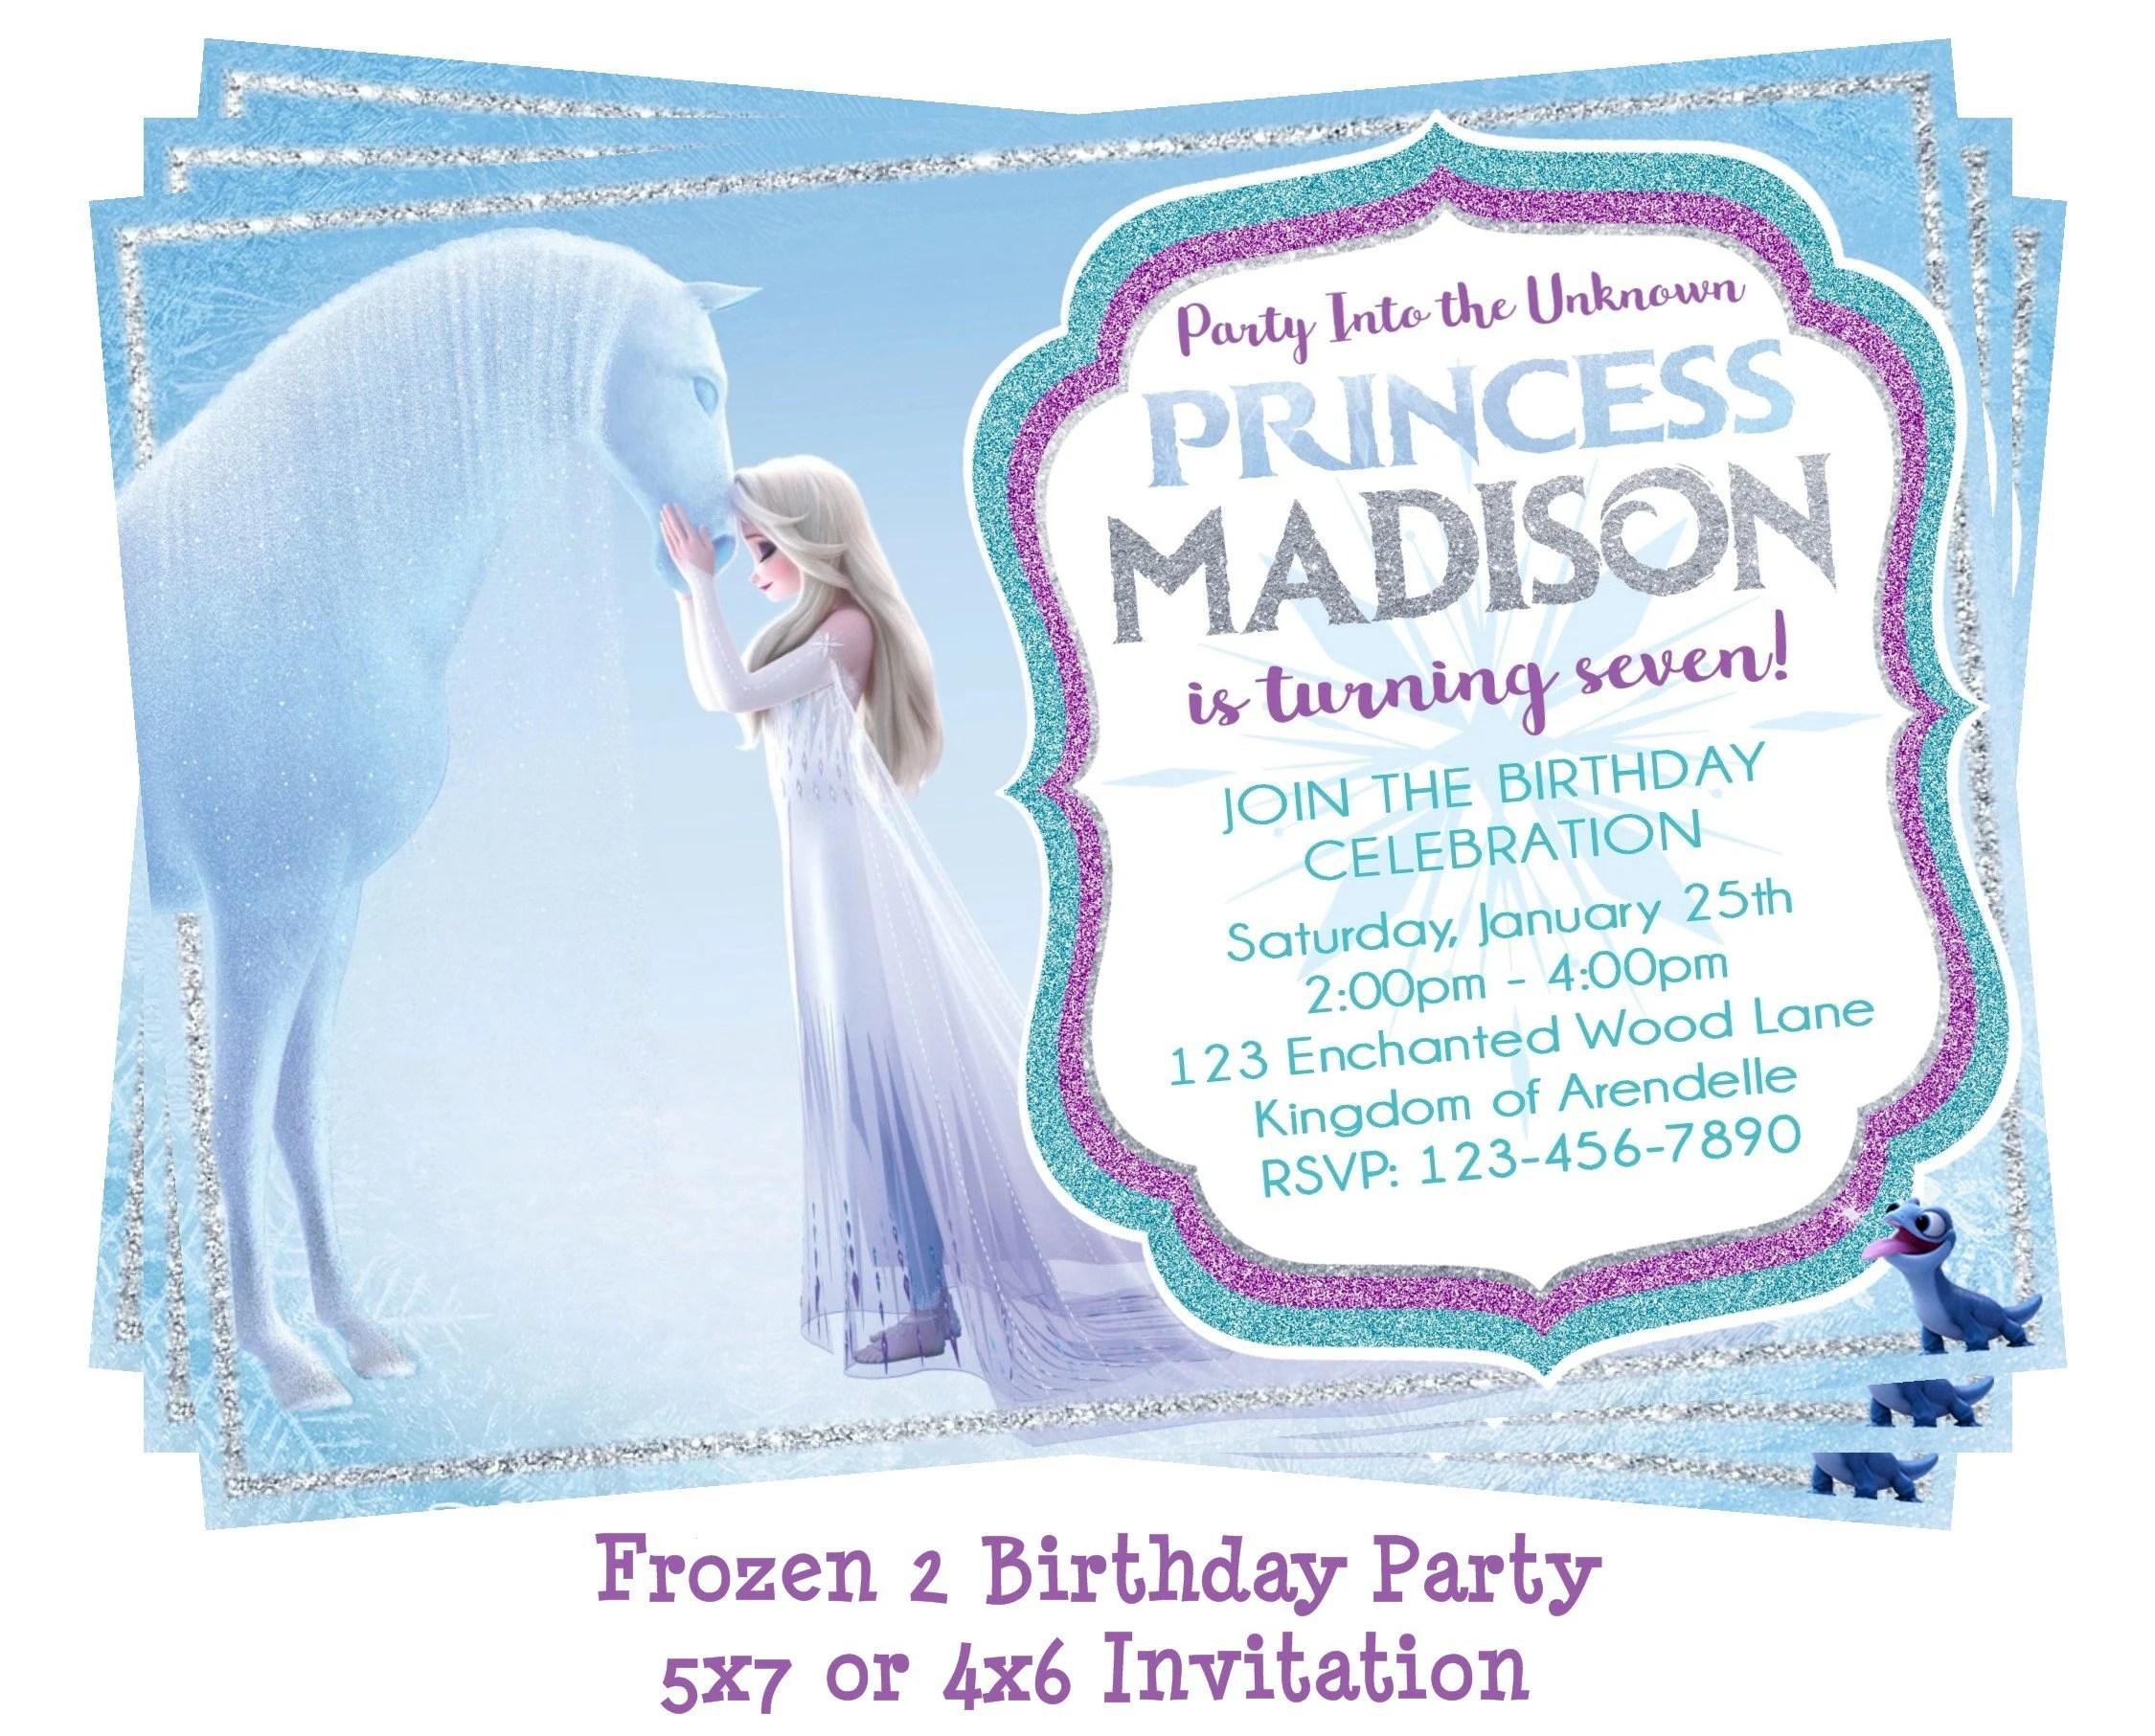 frozen 2 birthday invitation frozen 2 invitation frozen 2 party invitation elsa invitation printable 5x7 4x6 digital download